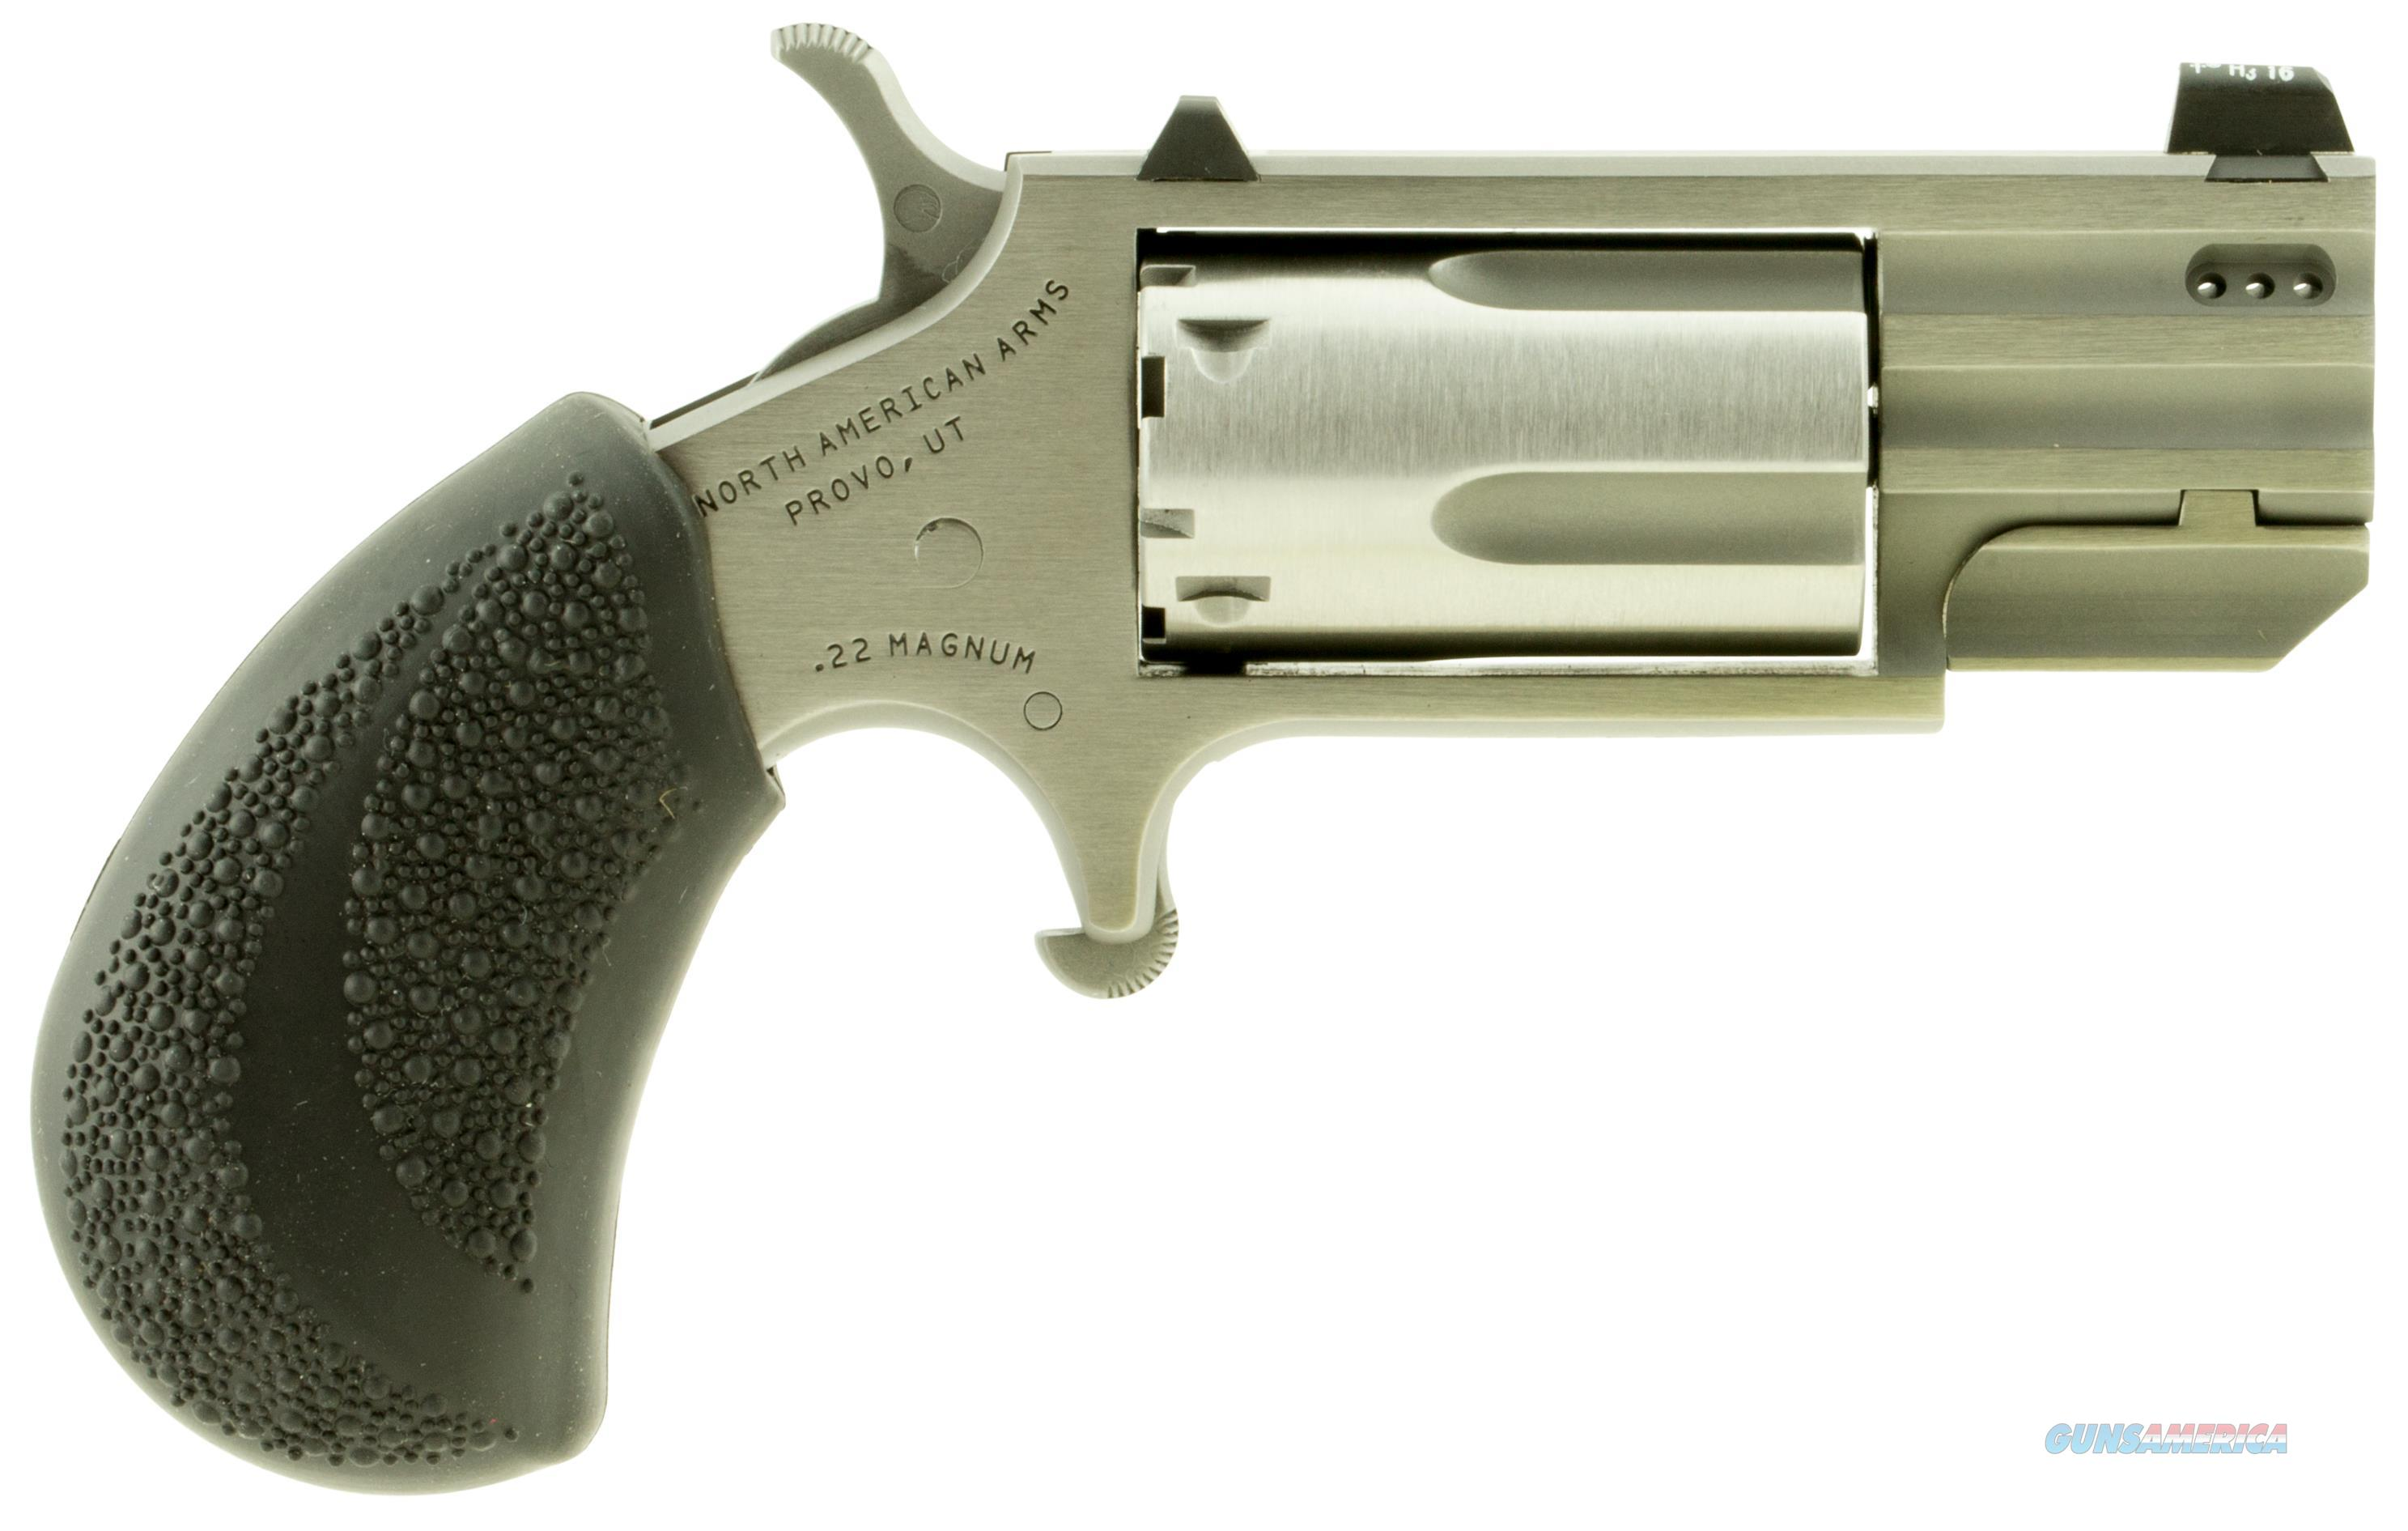 "Naa Pug 1"" 22Wmr Xs Sight PUGDP  Guns > Pistols > North American Arms Pistols"